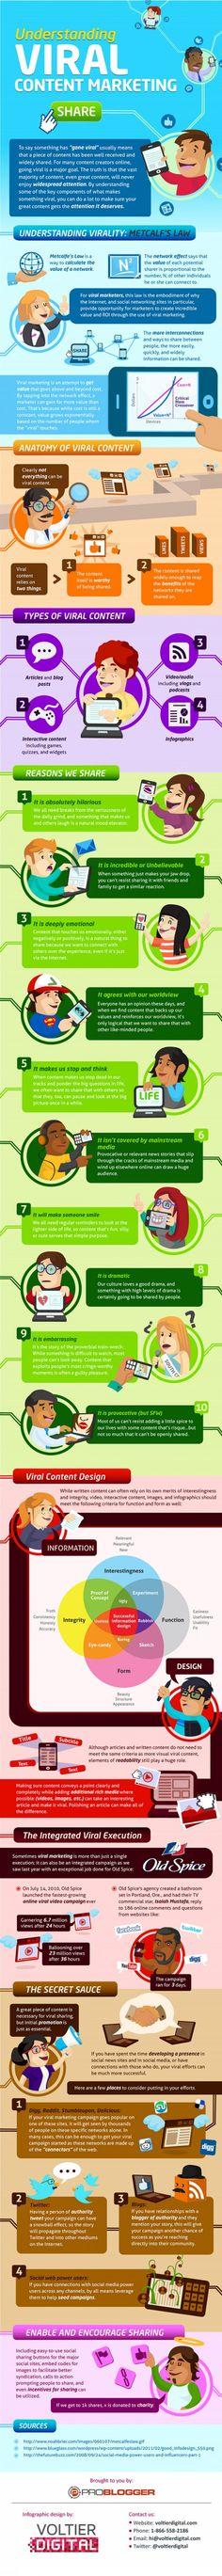 Understanding Viral Content Marketing from BrandLove, LLC